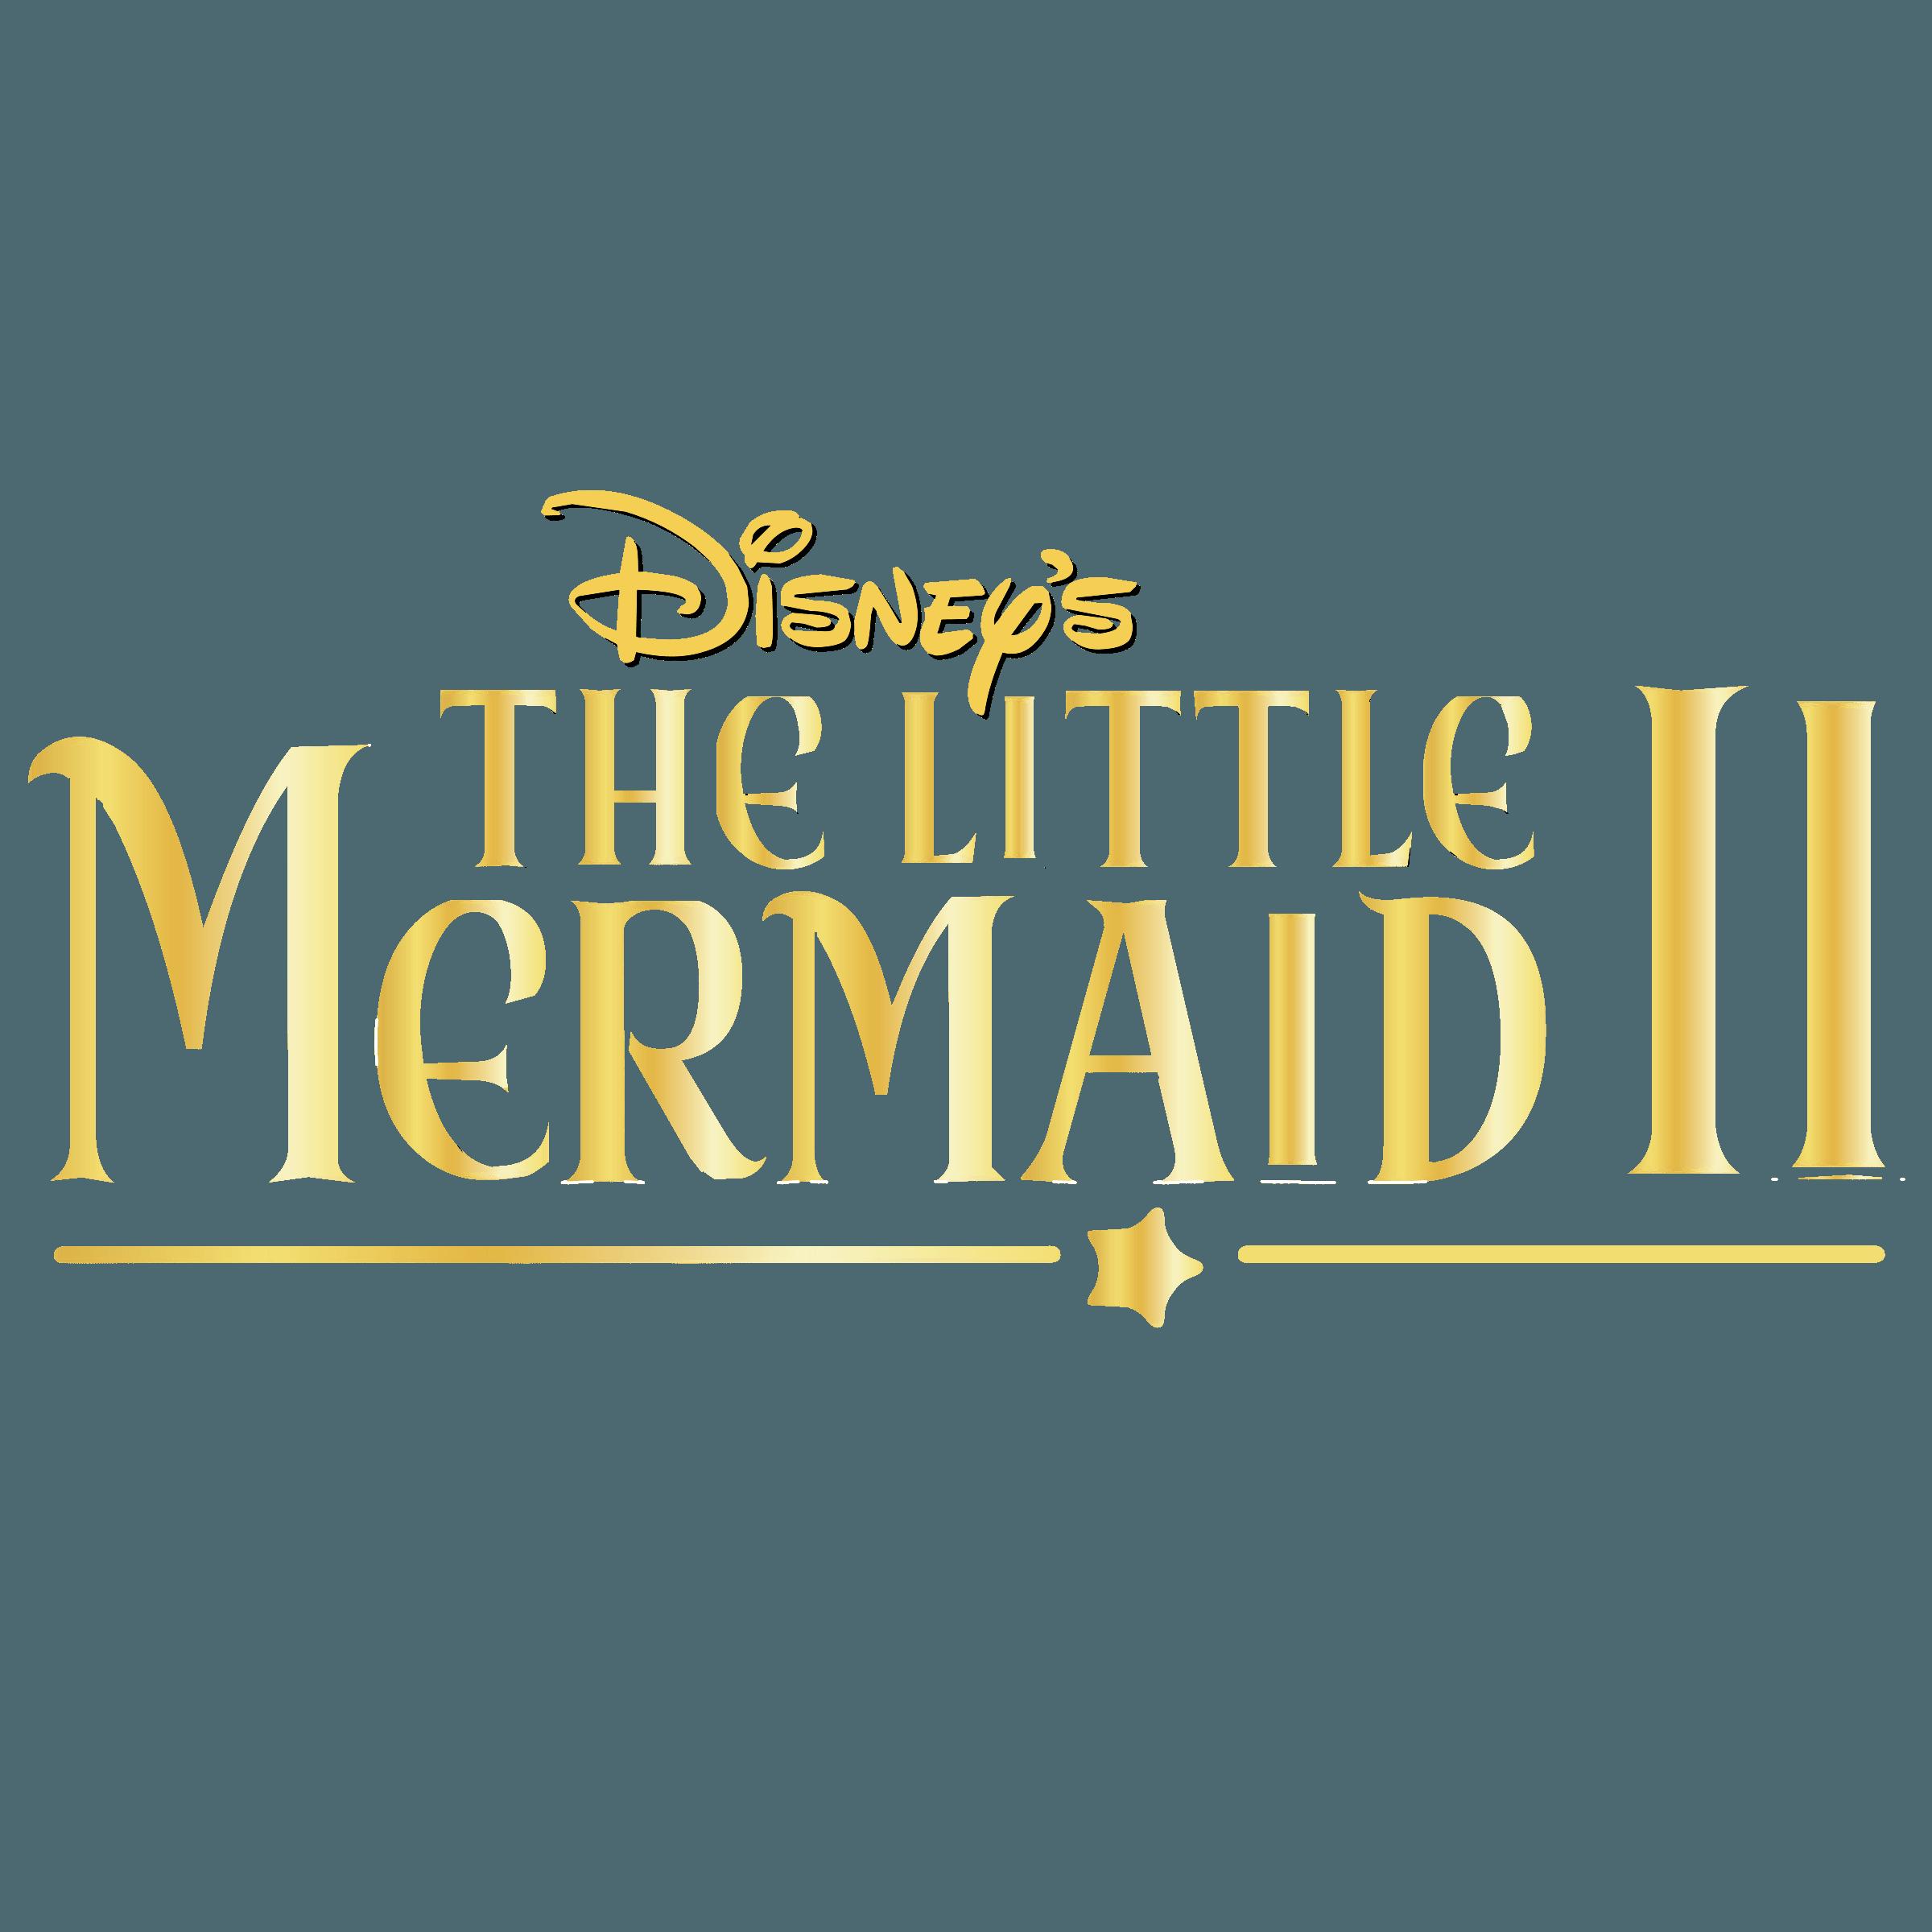 Disney Little Mermaid Logo - LogoDix